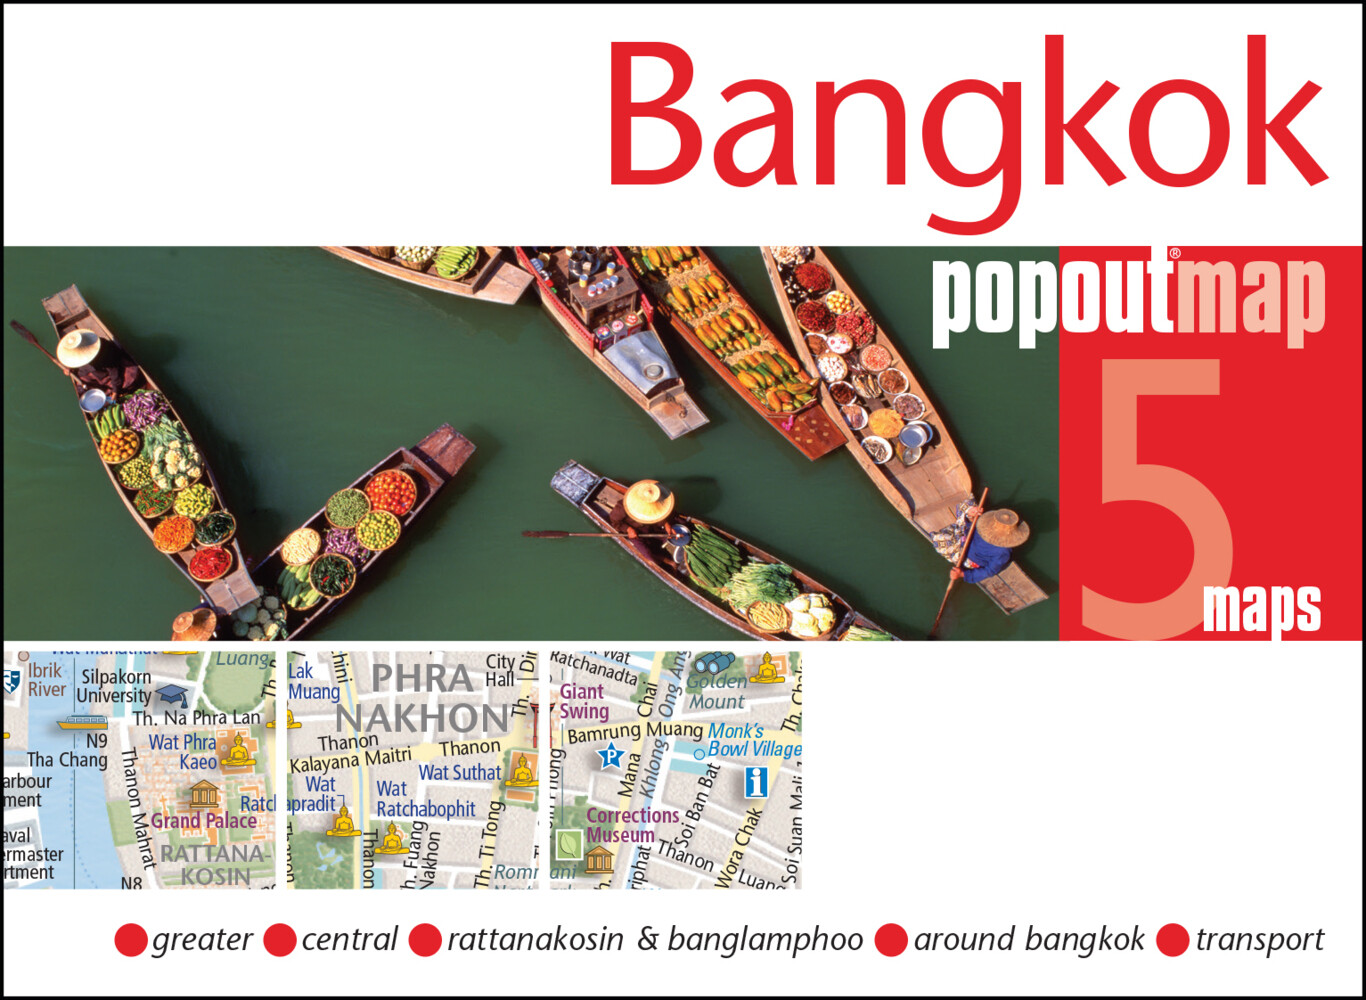 Bangkok Double als Buch von Popout Maps